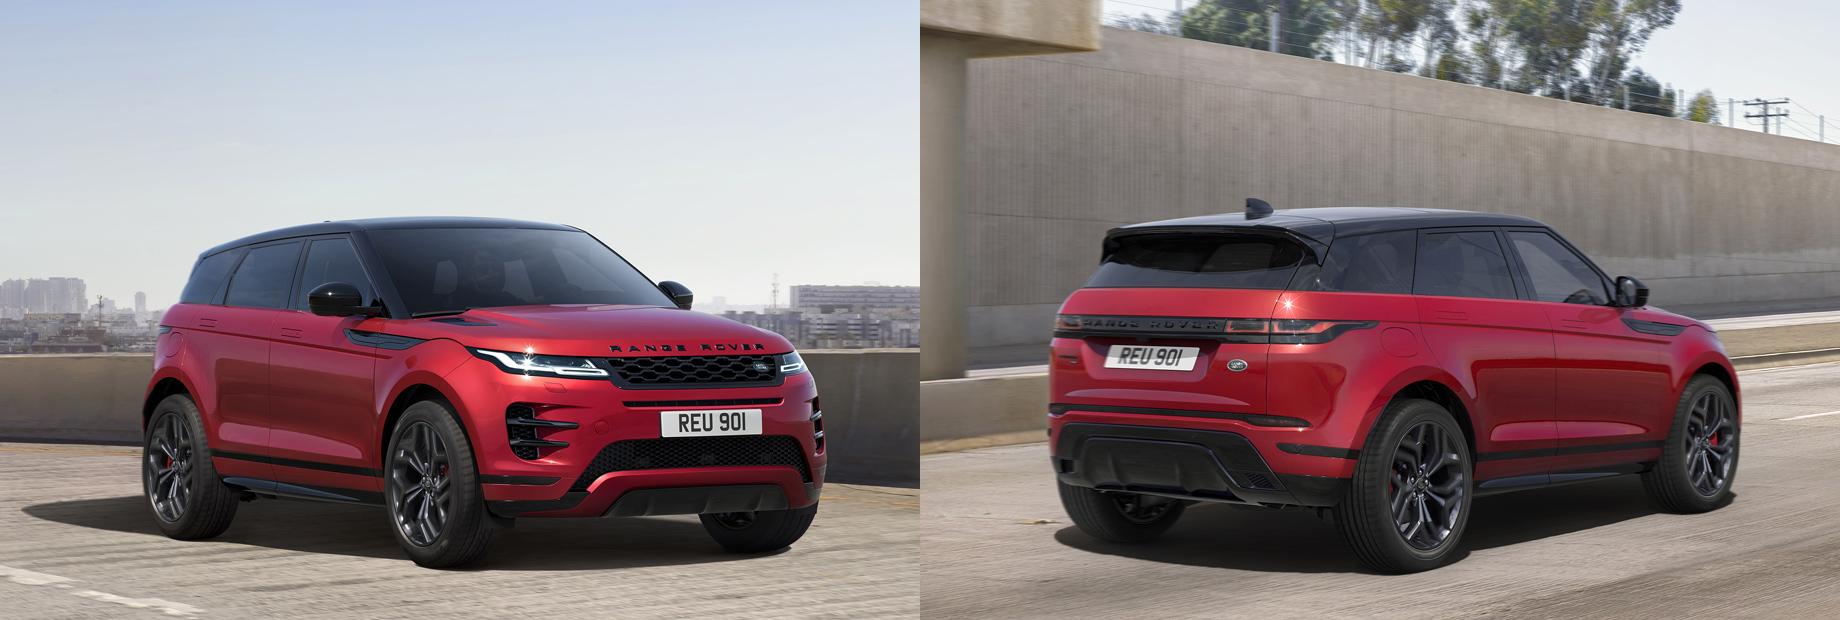 Range Rover Evoque обогатился версиями Bronze и HST